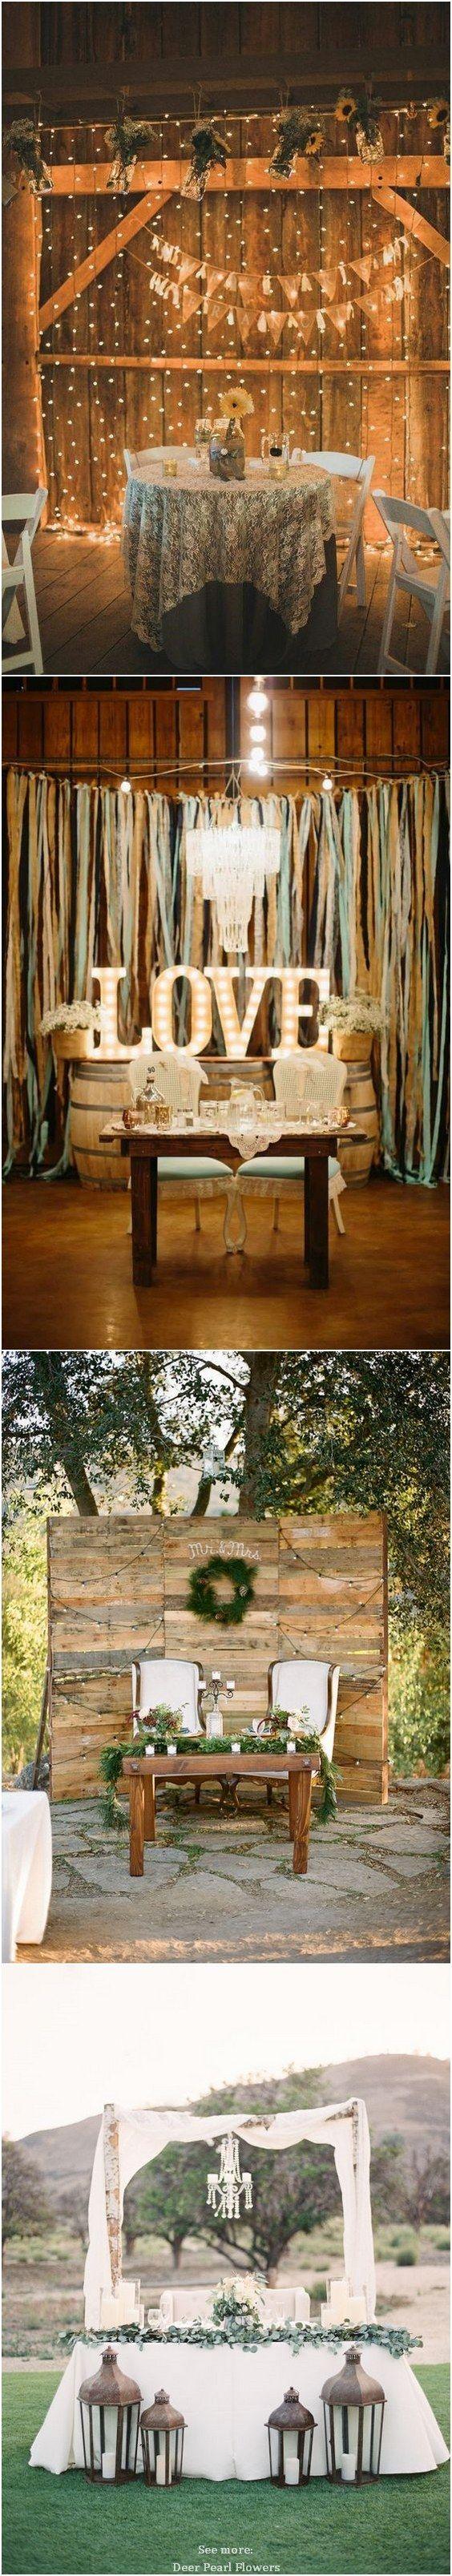 Top 20 Rustic Country Wedding Sweetheart Table Ideas | Sweetheart ...